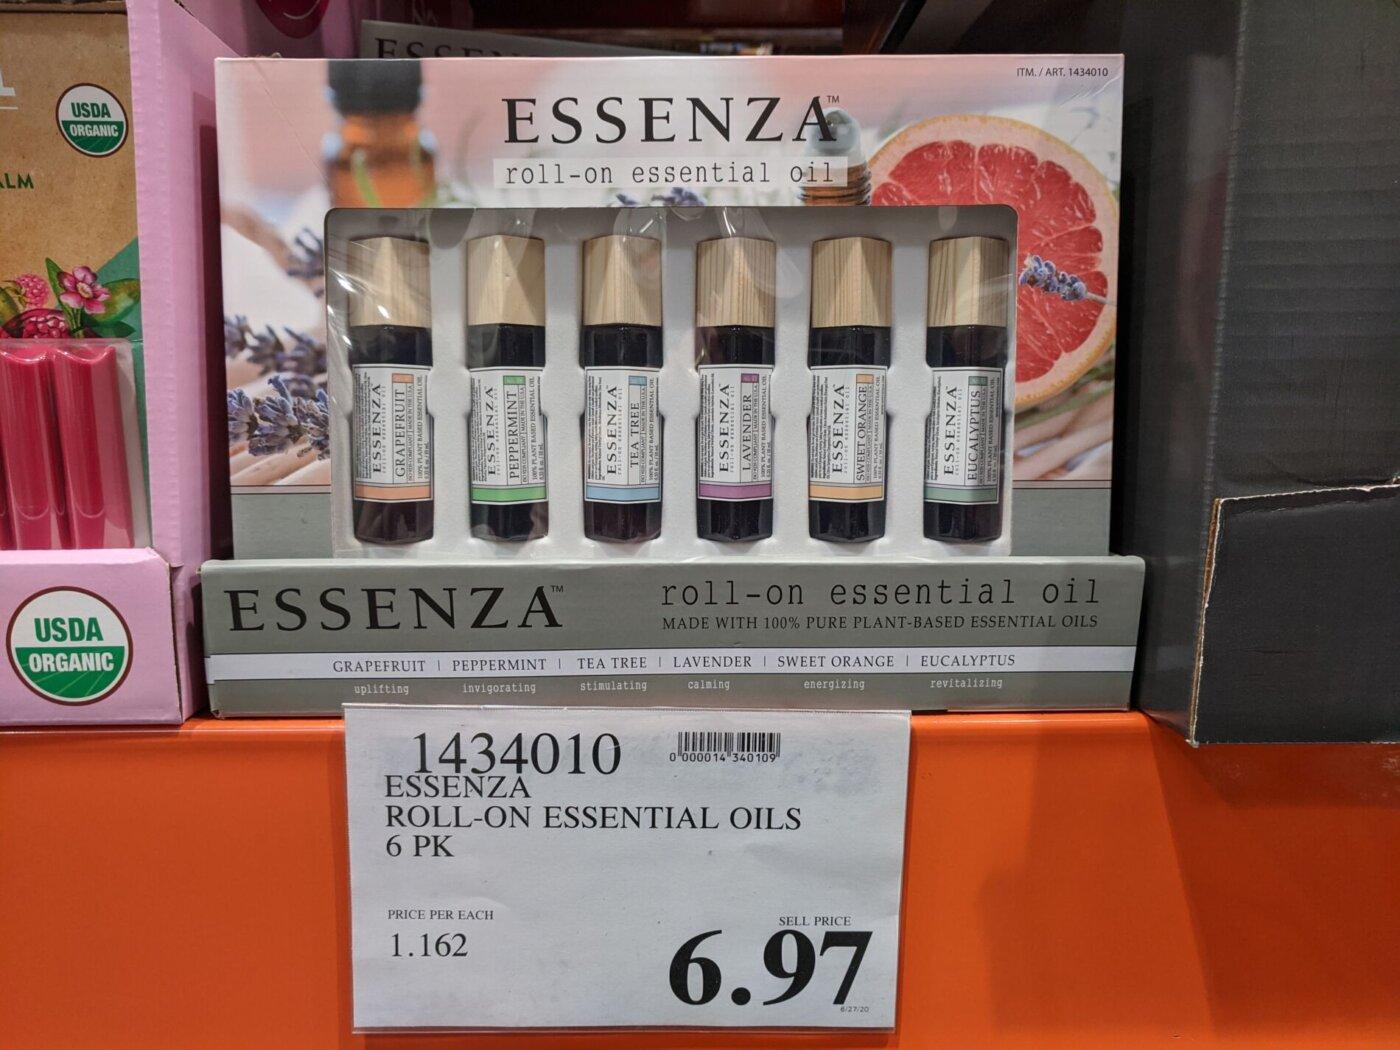 EssenzaRollOnEssentialOil-1434010